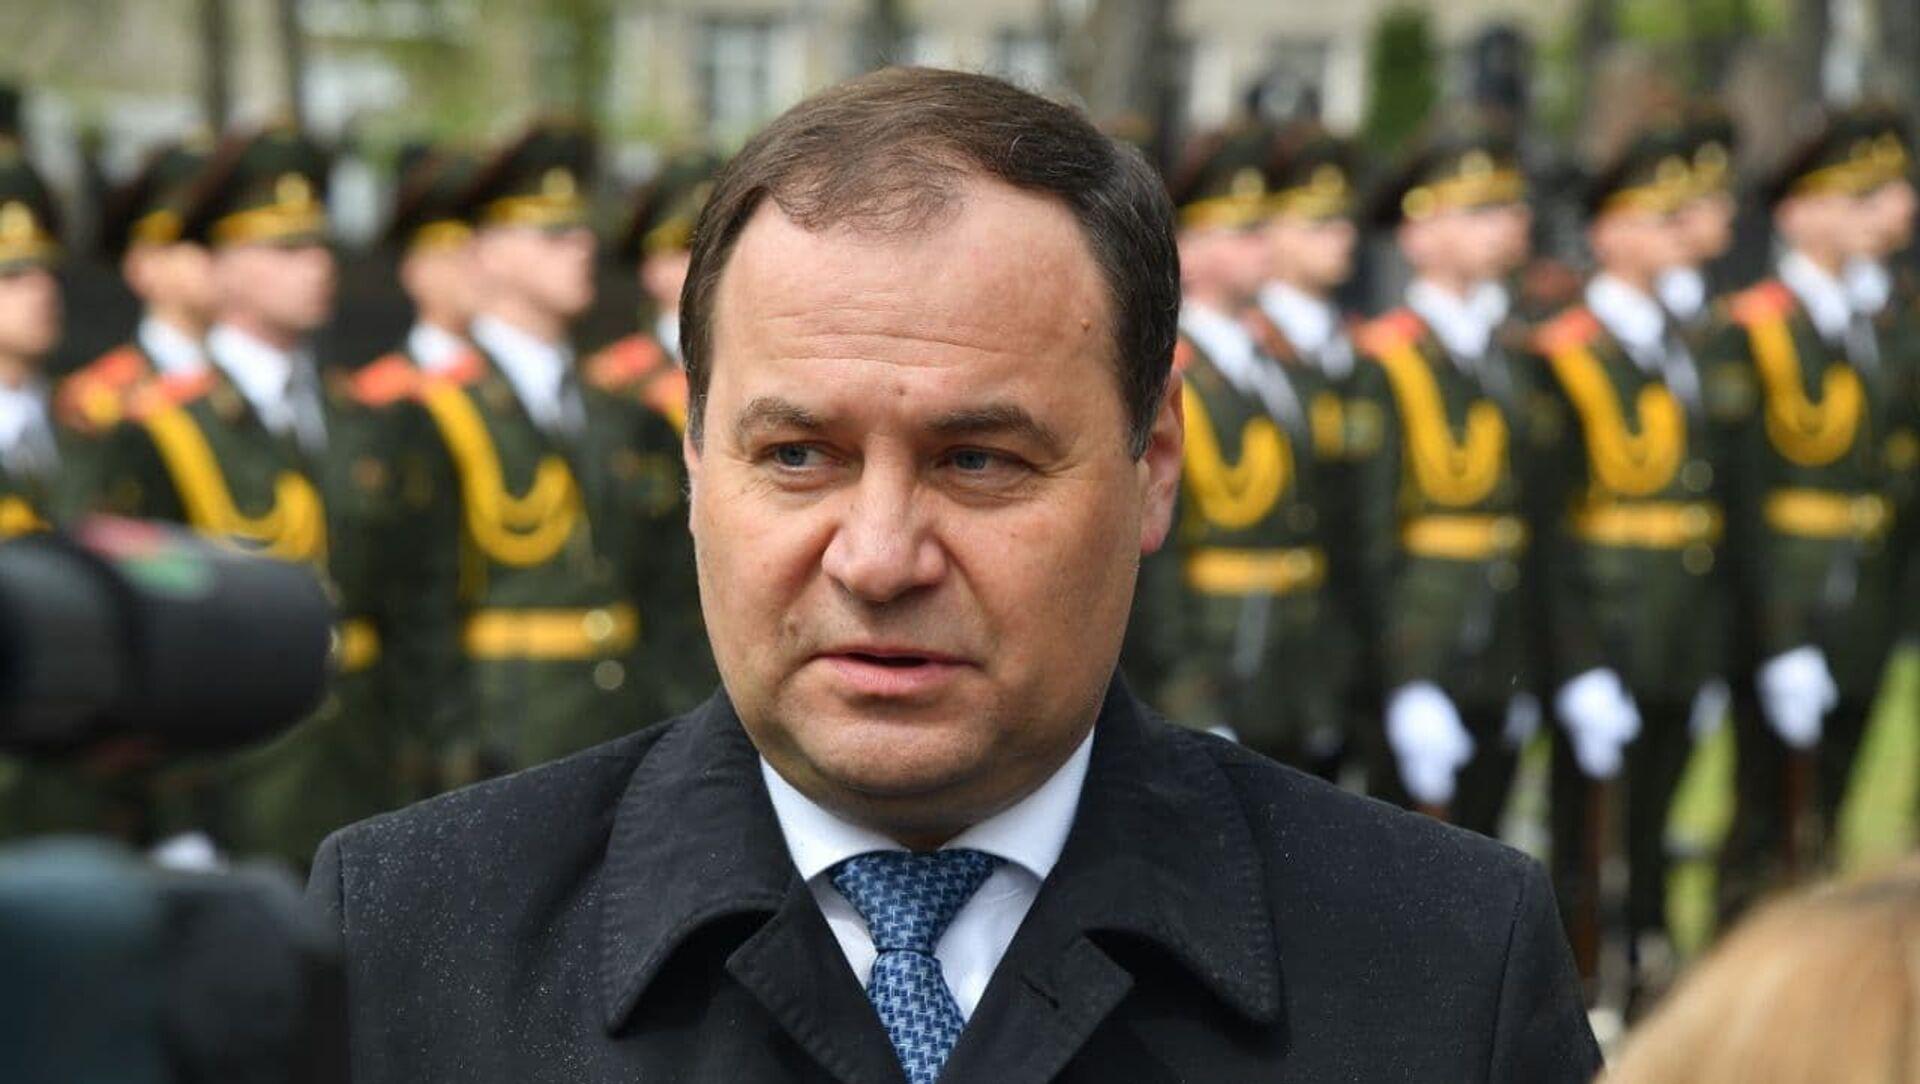 Премьер-министр Беларуси Роман Головченко  - Sputnik Беларусь, 1920, 07.05.2021